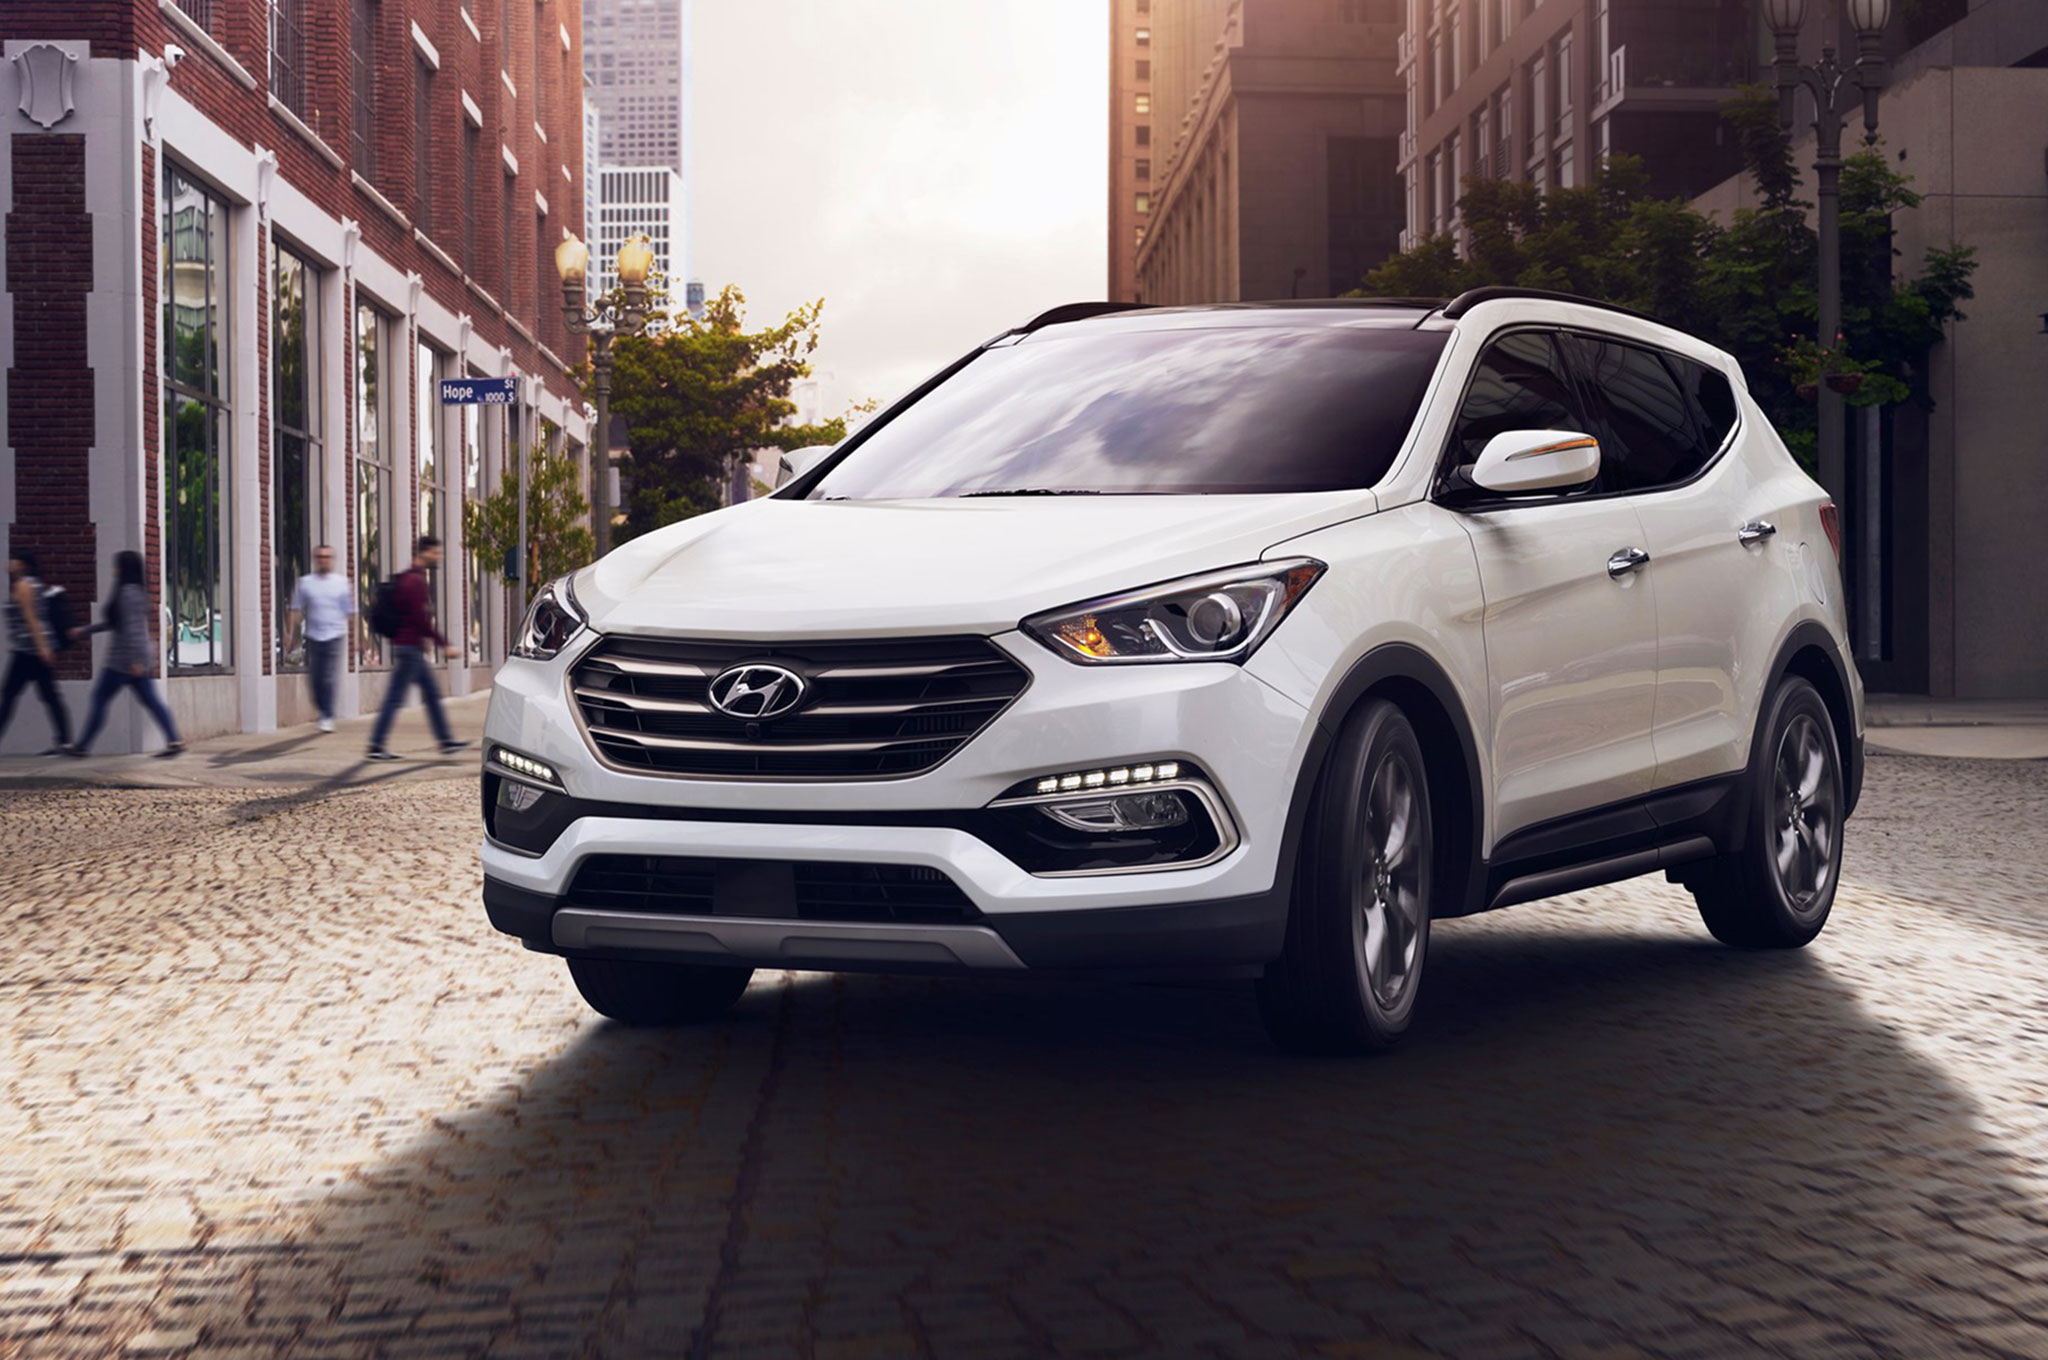 2013 Hyundai Santa Fe Sport Named One of Wards 10 Best Interiors